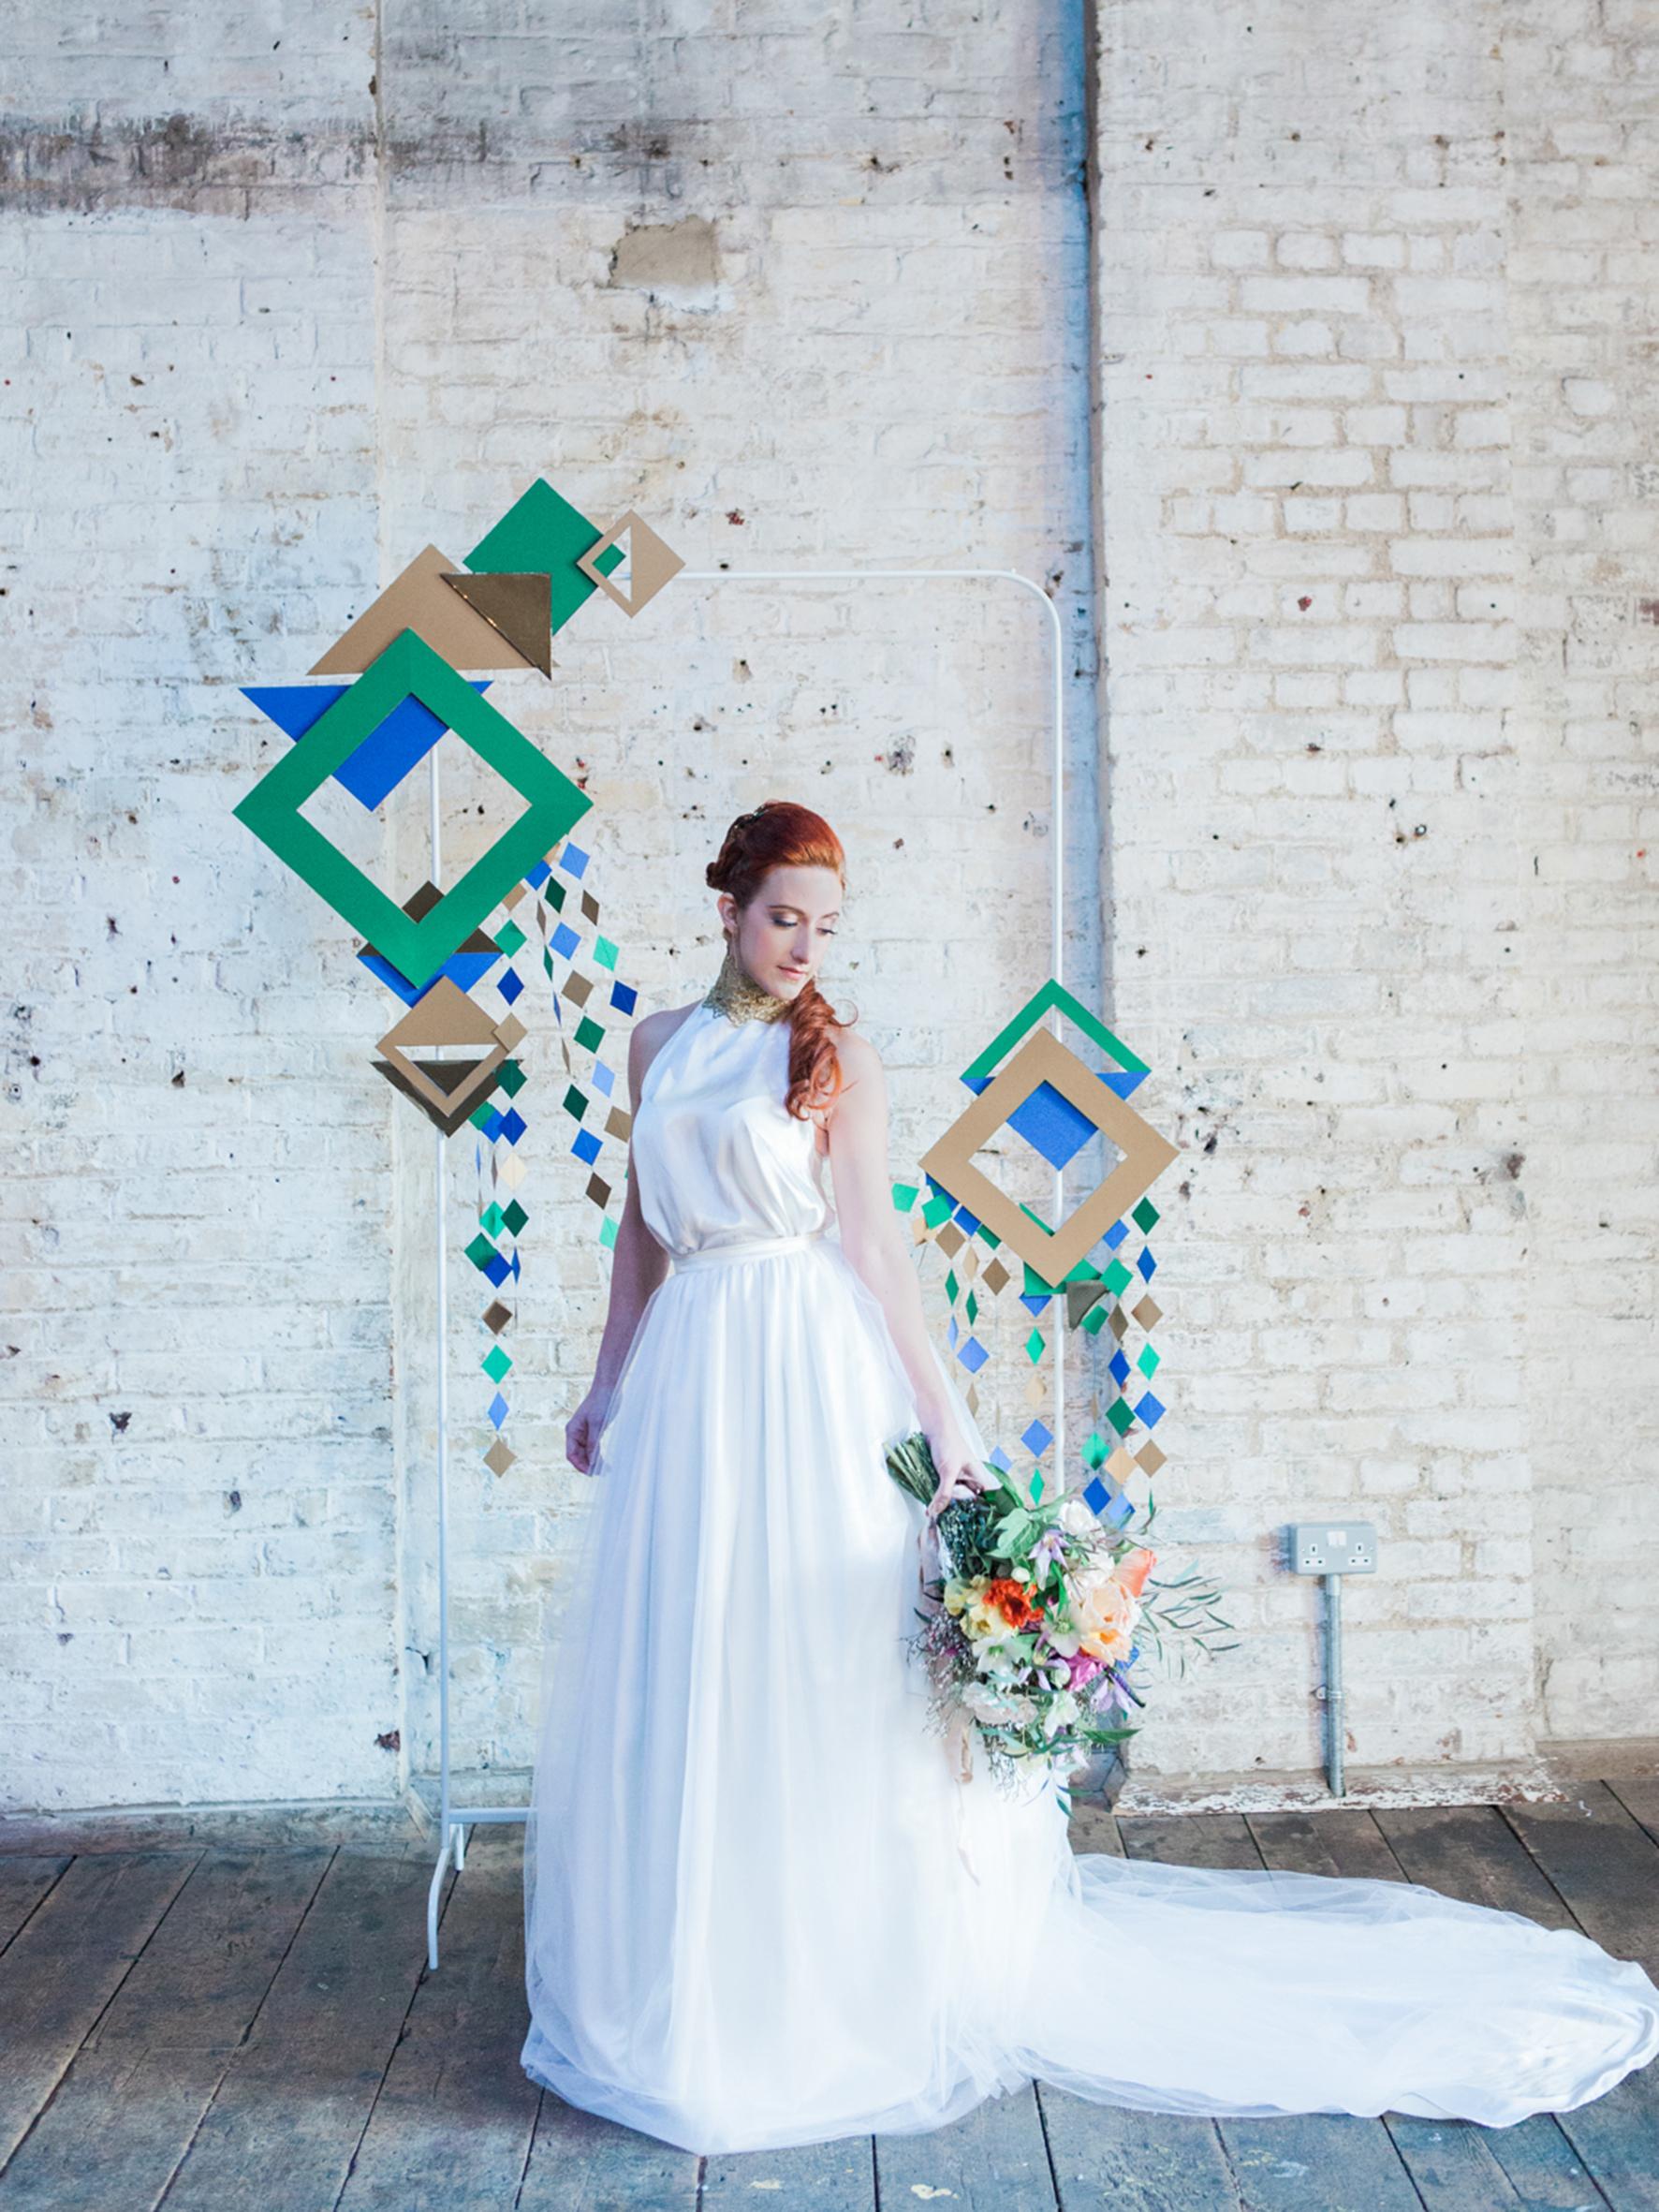 bloved-wedding-blog-urban-geomentric-wedding-amanda-karen-photography-26